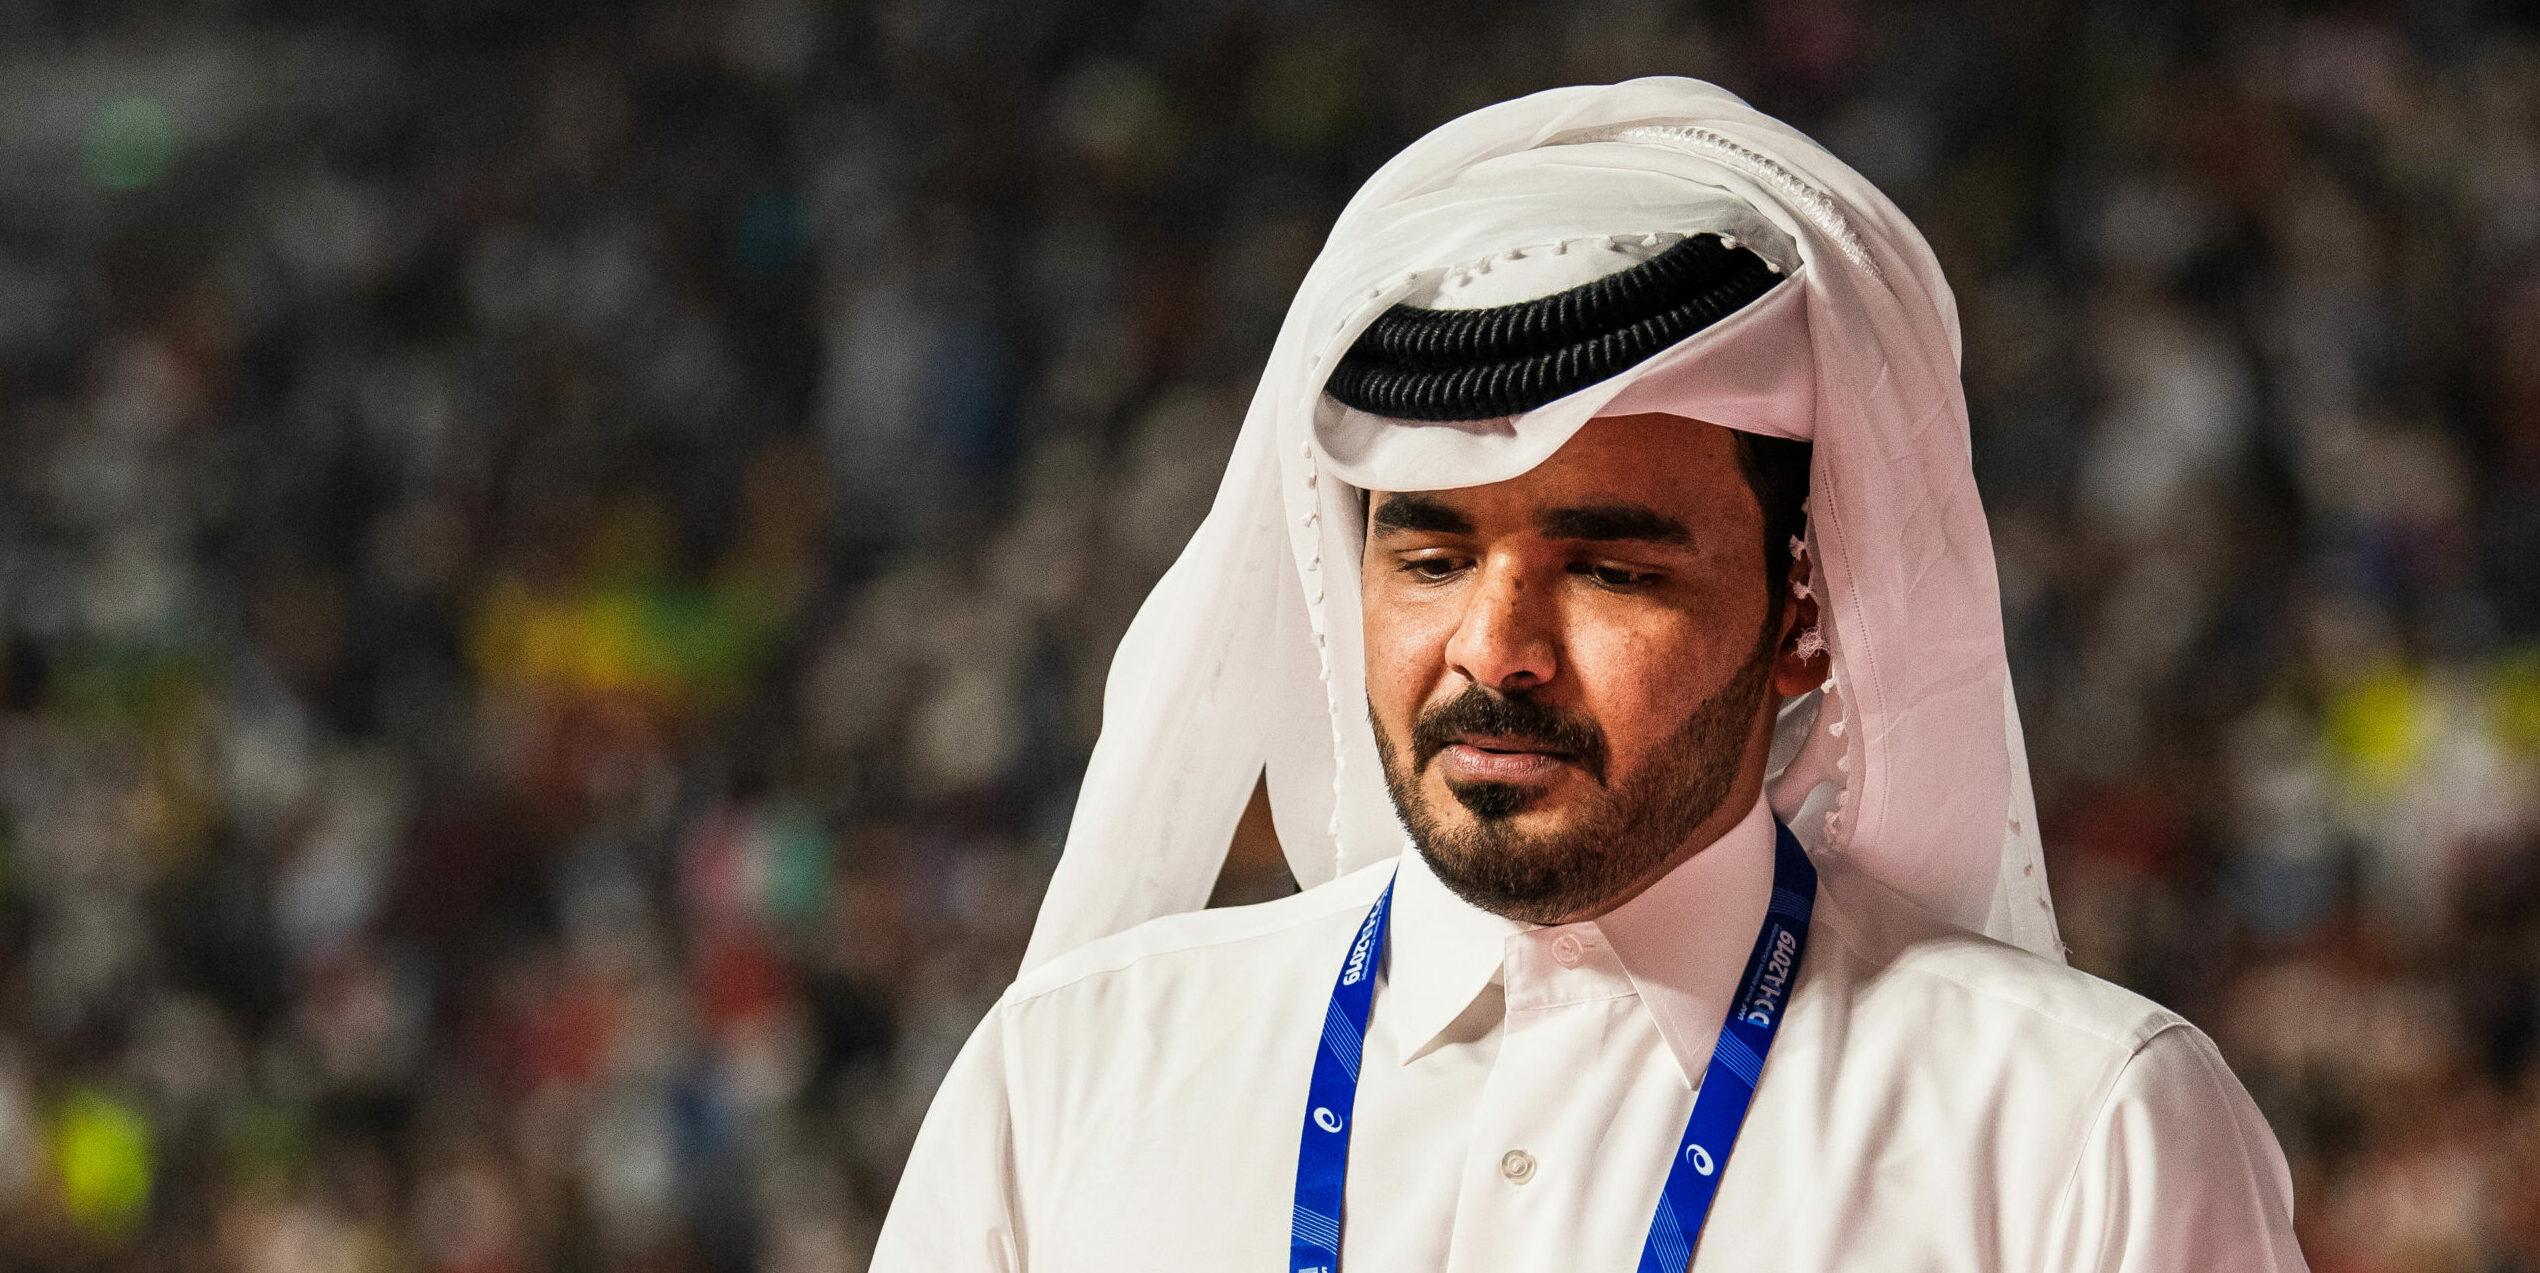 Sheikh Joaan bin Hamad Al Thani | Europa Press